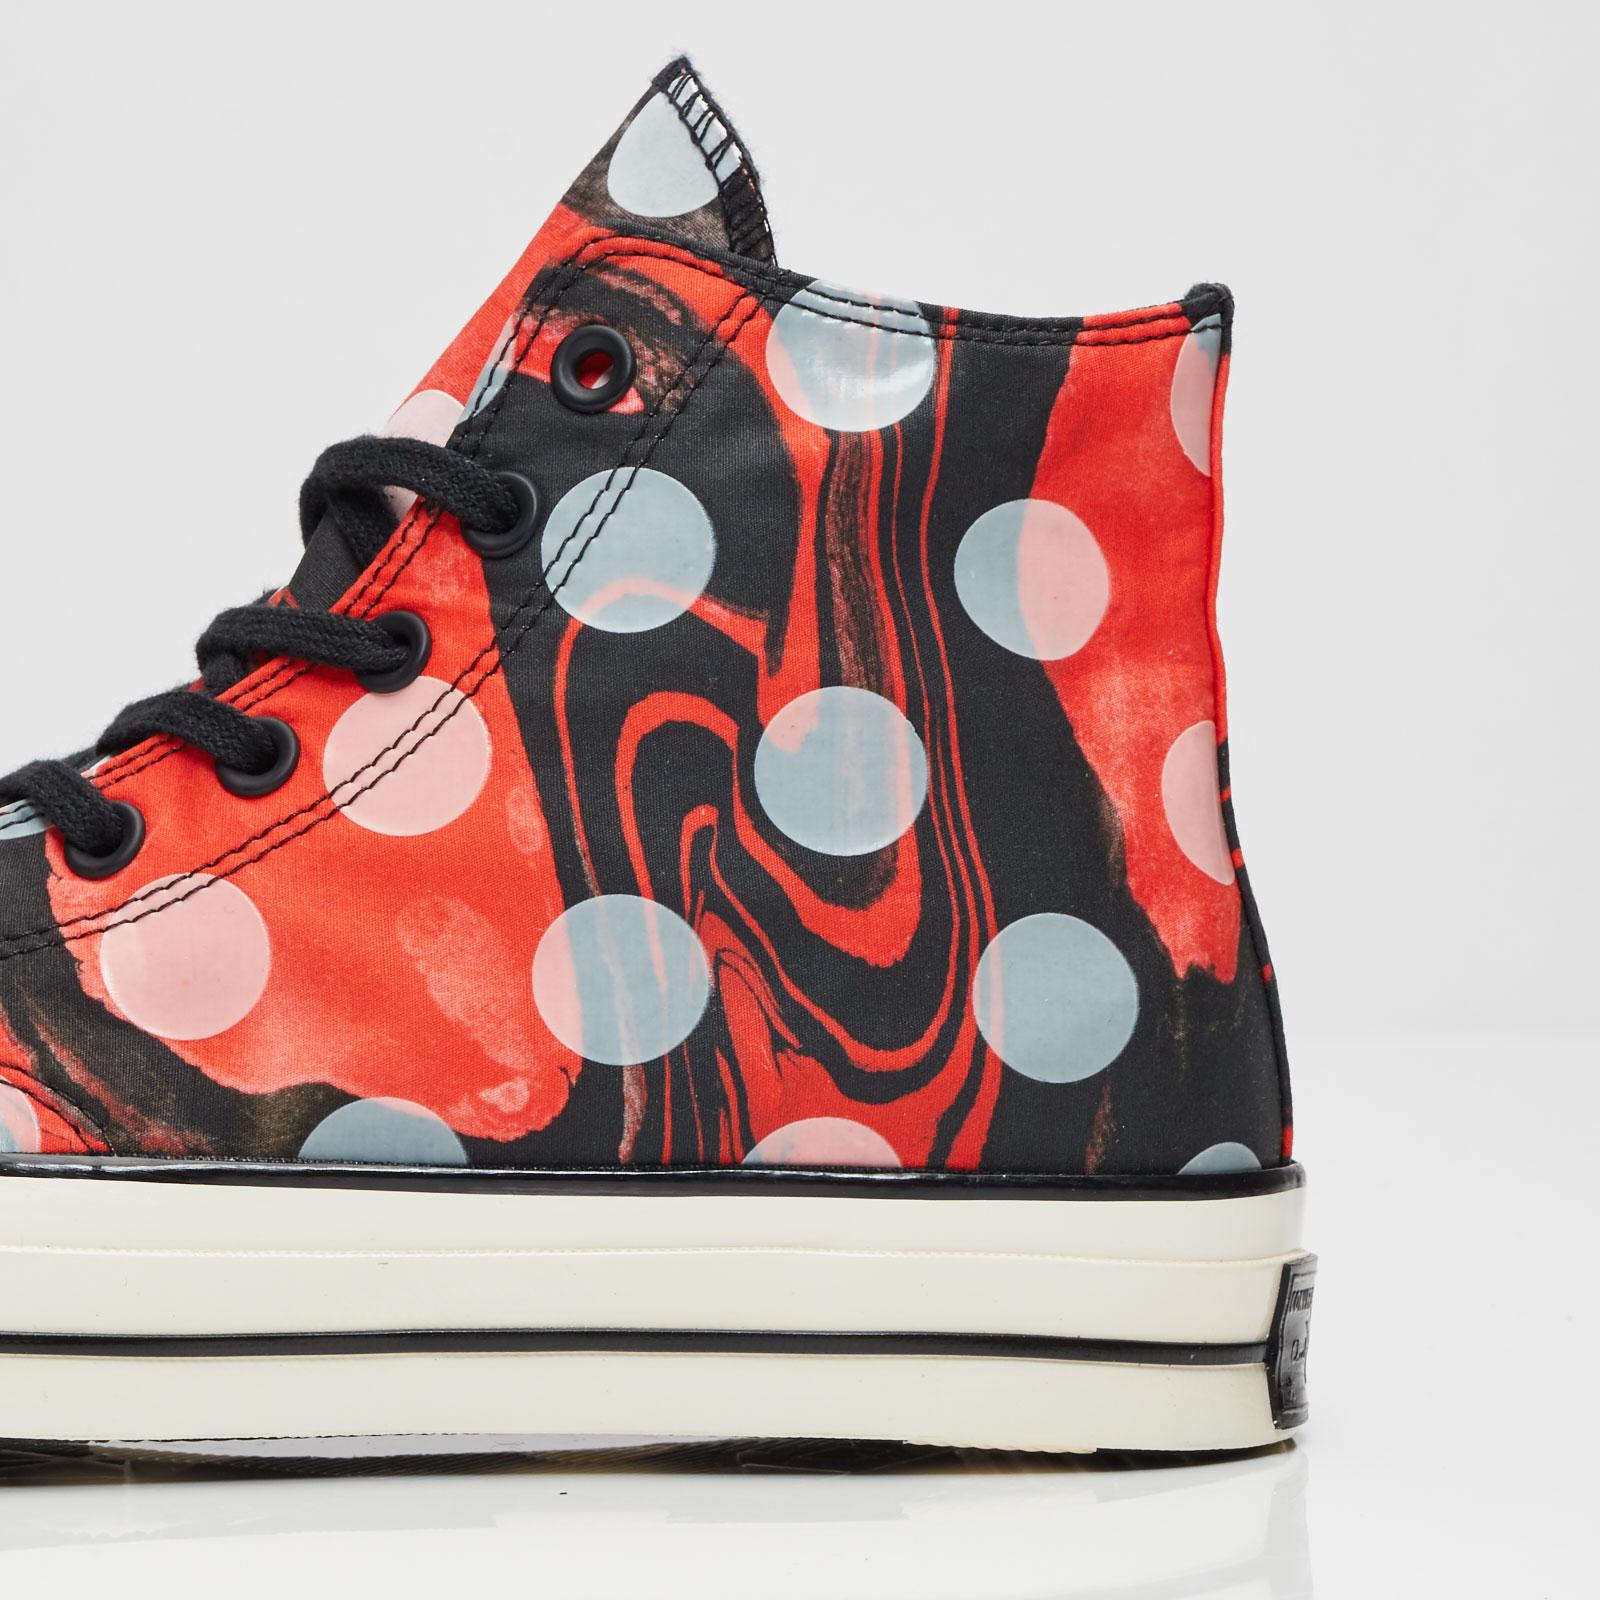 1e10bf2415efa9 Converse Chuck Taylor All-Star 70 Hi - 155012c - Sneakersnstuff ...